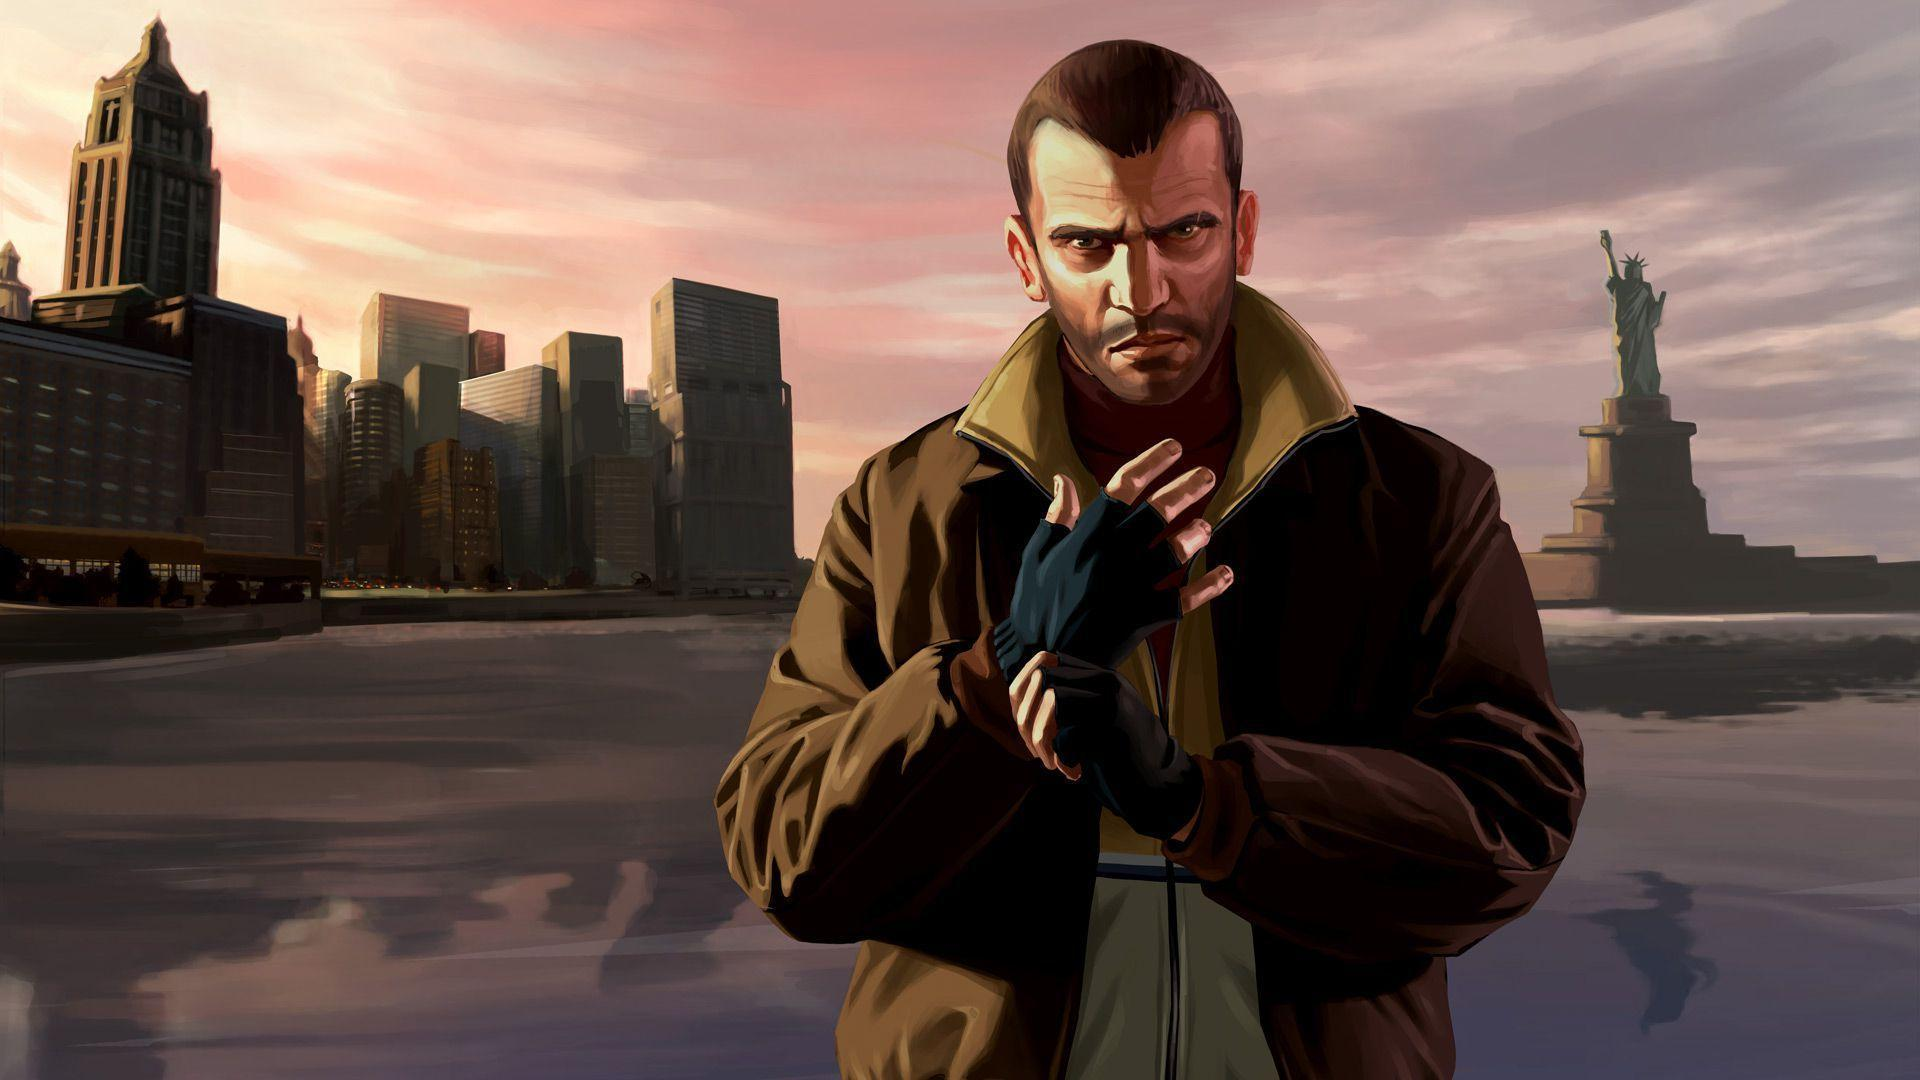 Video Games Grand Theft Auto Niko Bellic Gta Iv Fresh New Hd Wallpaper